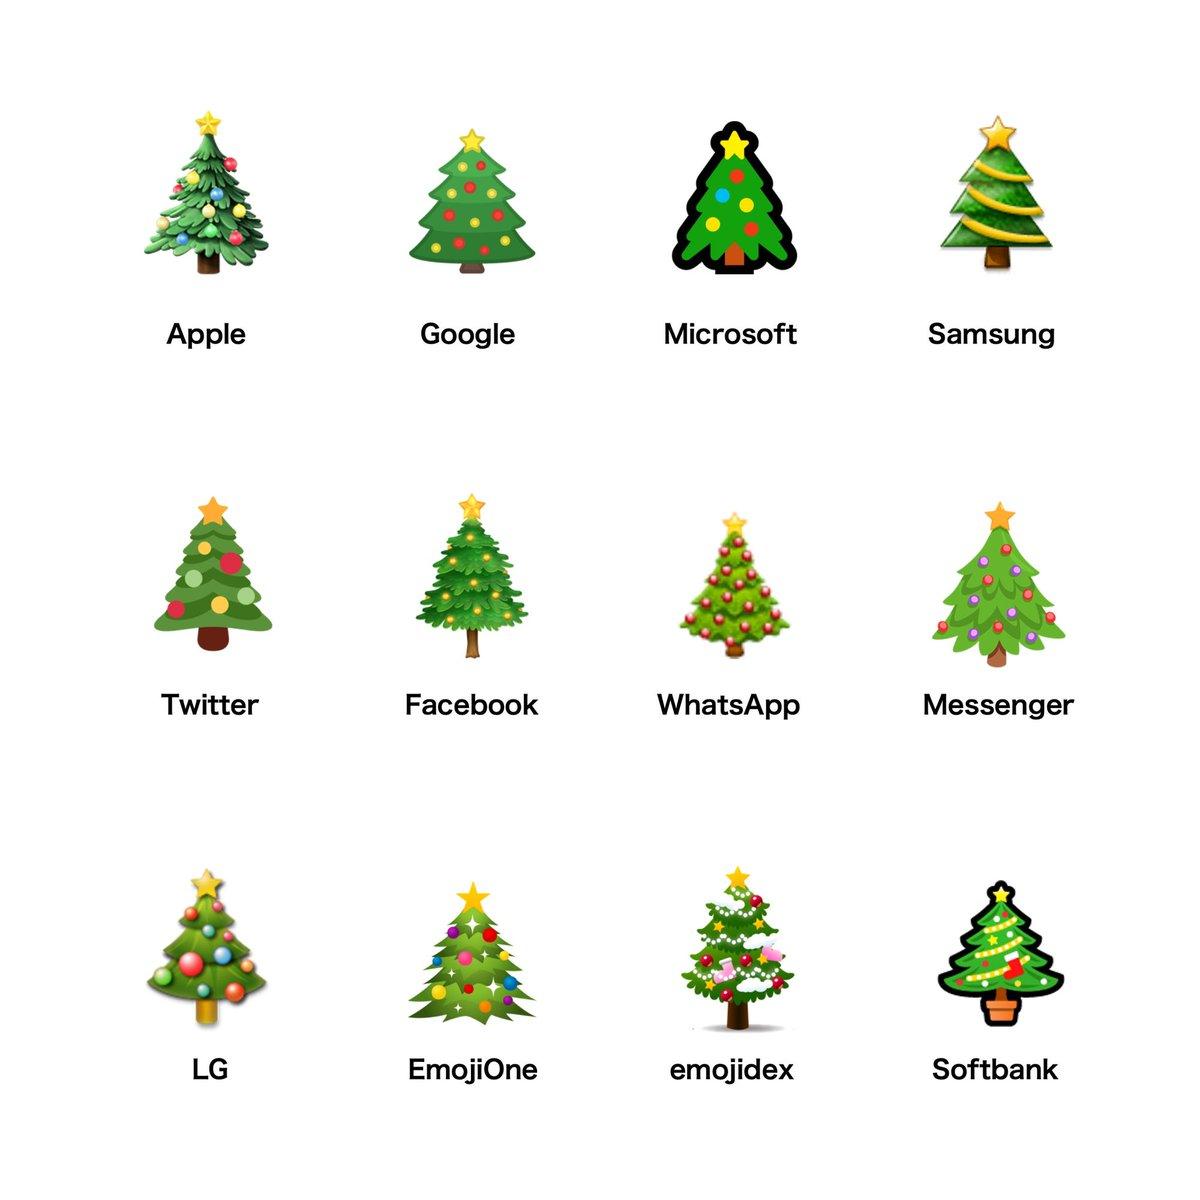 Emojipedia On Twitter Santa Emoji On Facebook 2014 Present